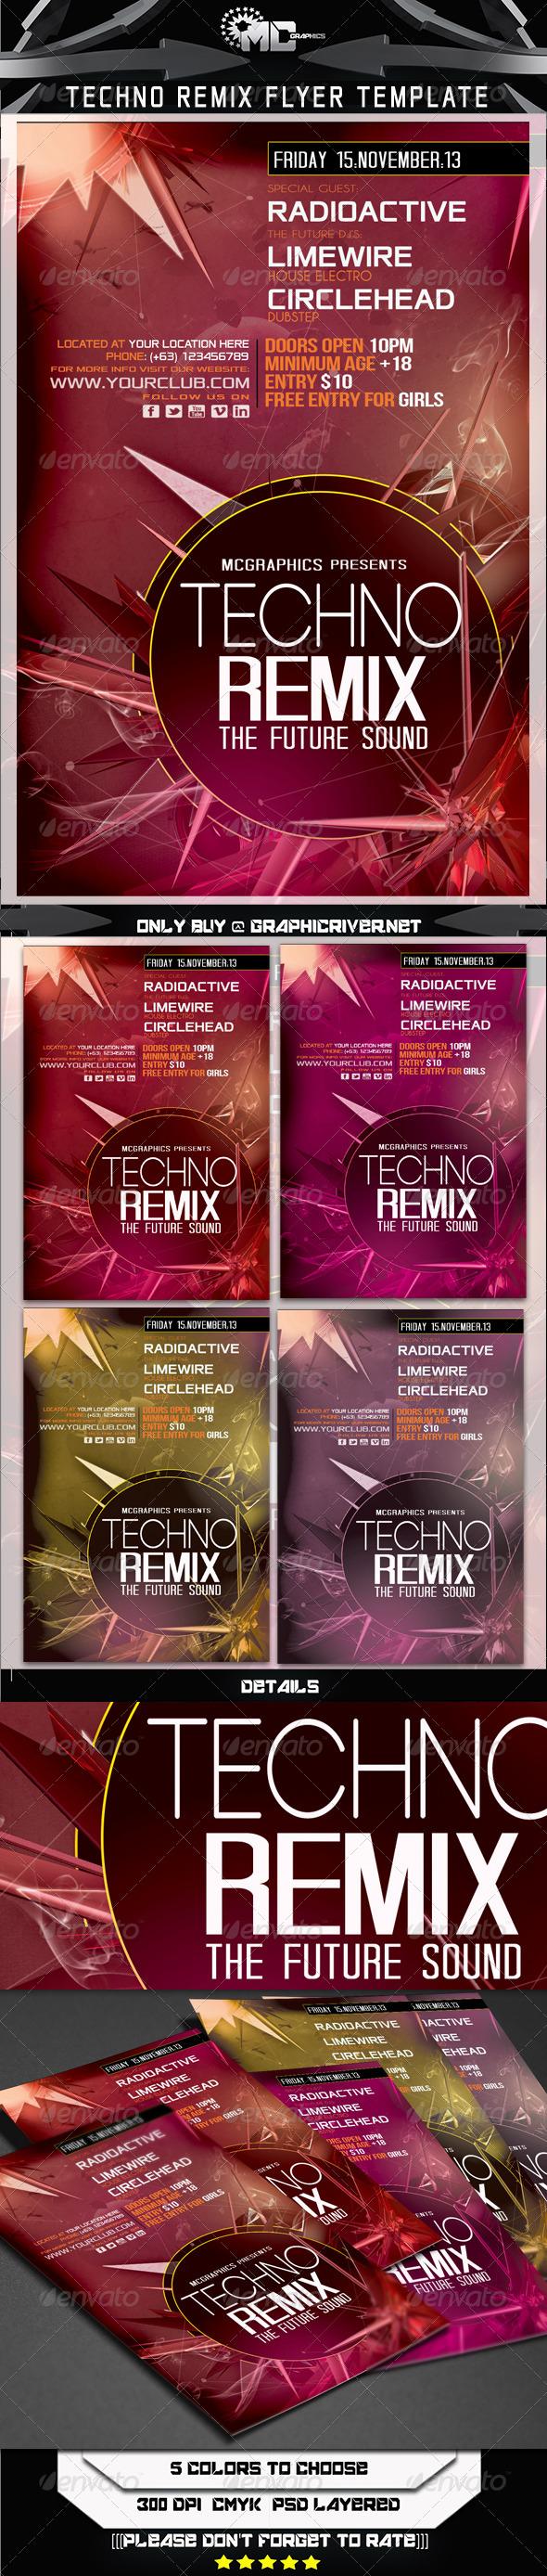 Techno Remix Flyer Template - Flyers Print Templates